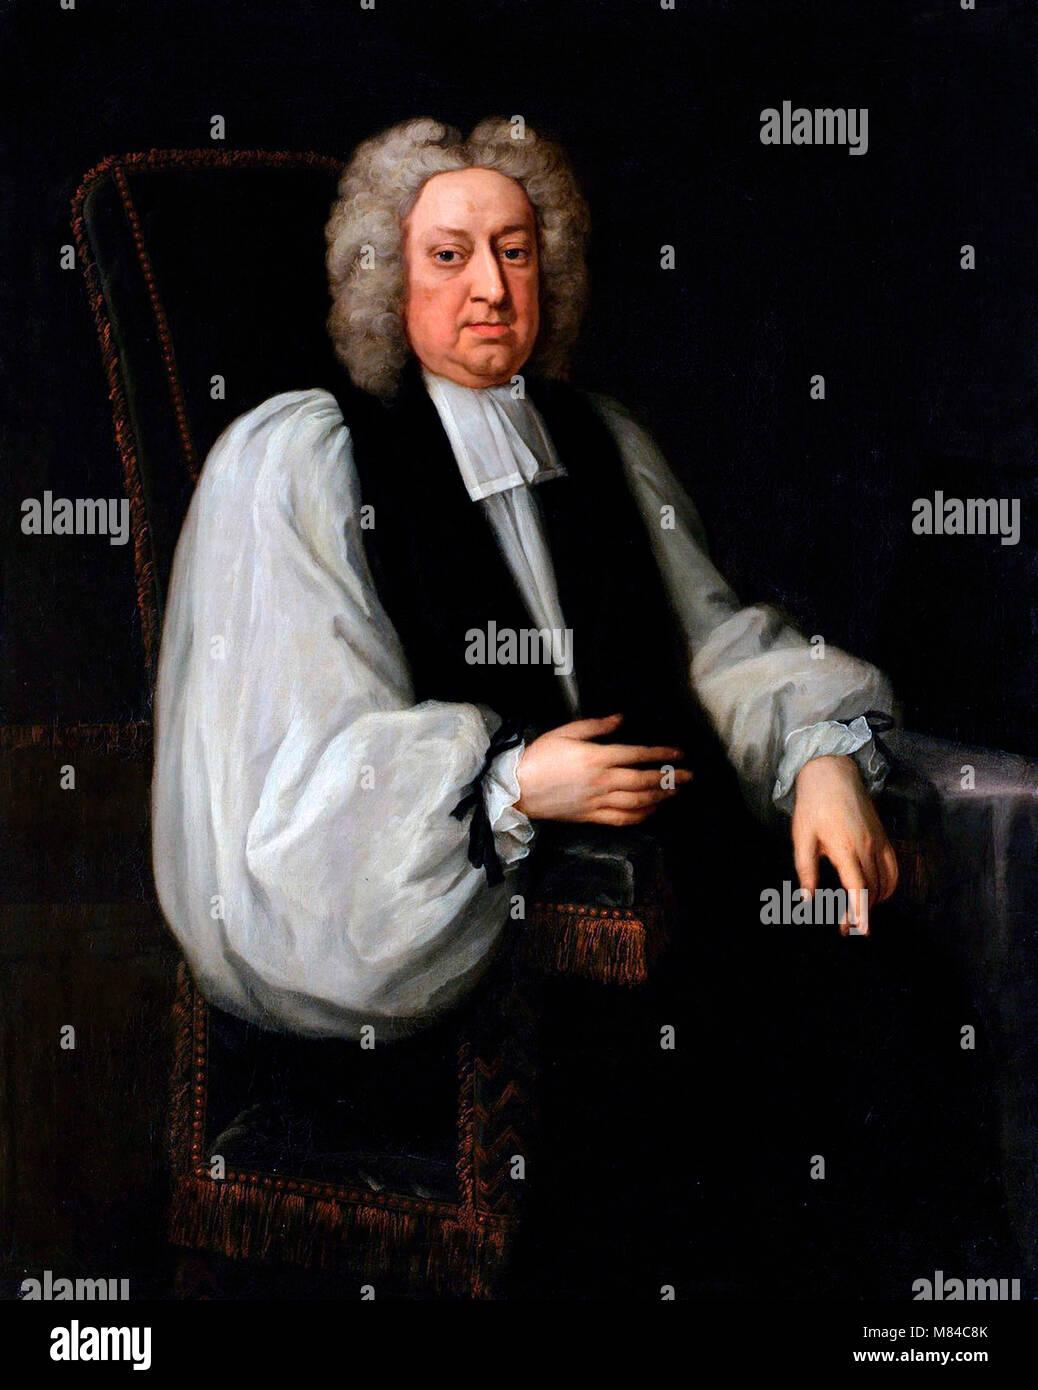 Jonathan Swift (1667-1745). Portrait of the Anglo-Irish satirist Jonathan Swift by Michael Dahl. - Stock Image